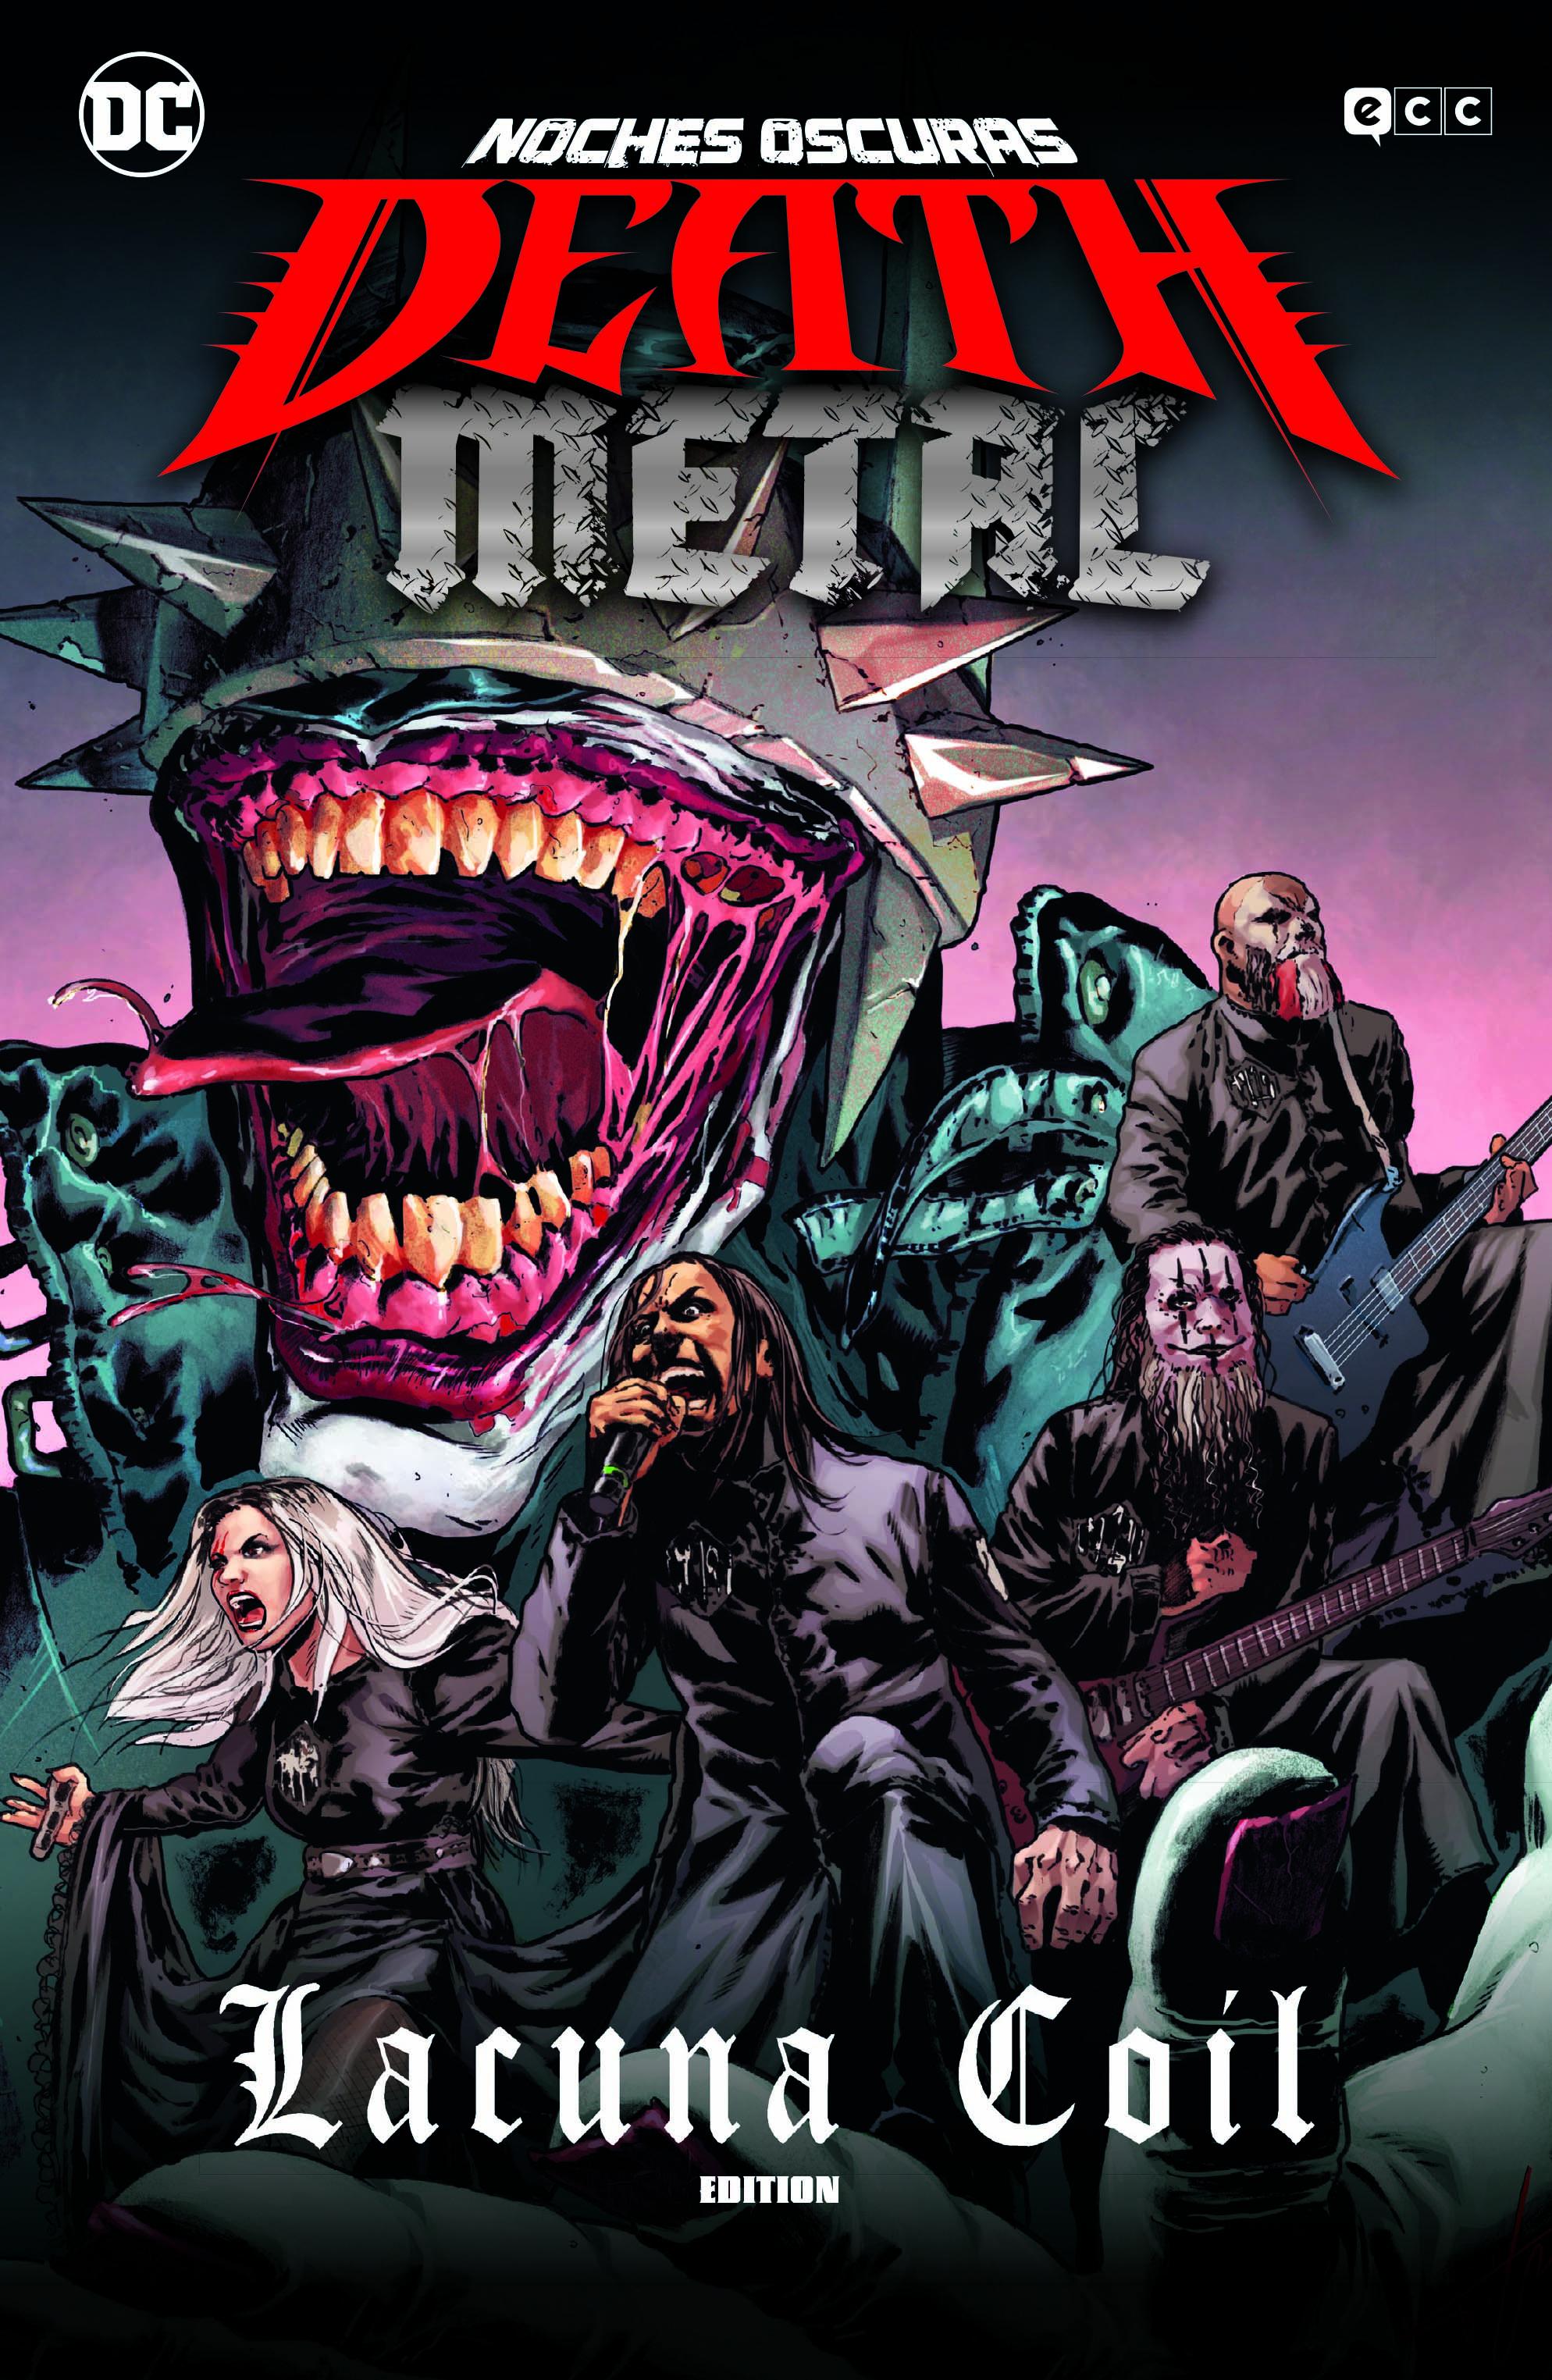 ECC - RUSTICA - Noches oscuras: Death Metal núm. 03 de 7 (Lacuna Coil Band Edition) (Rústica)